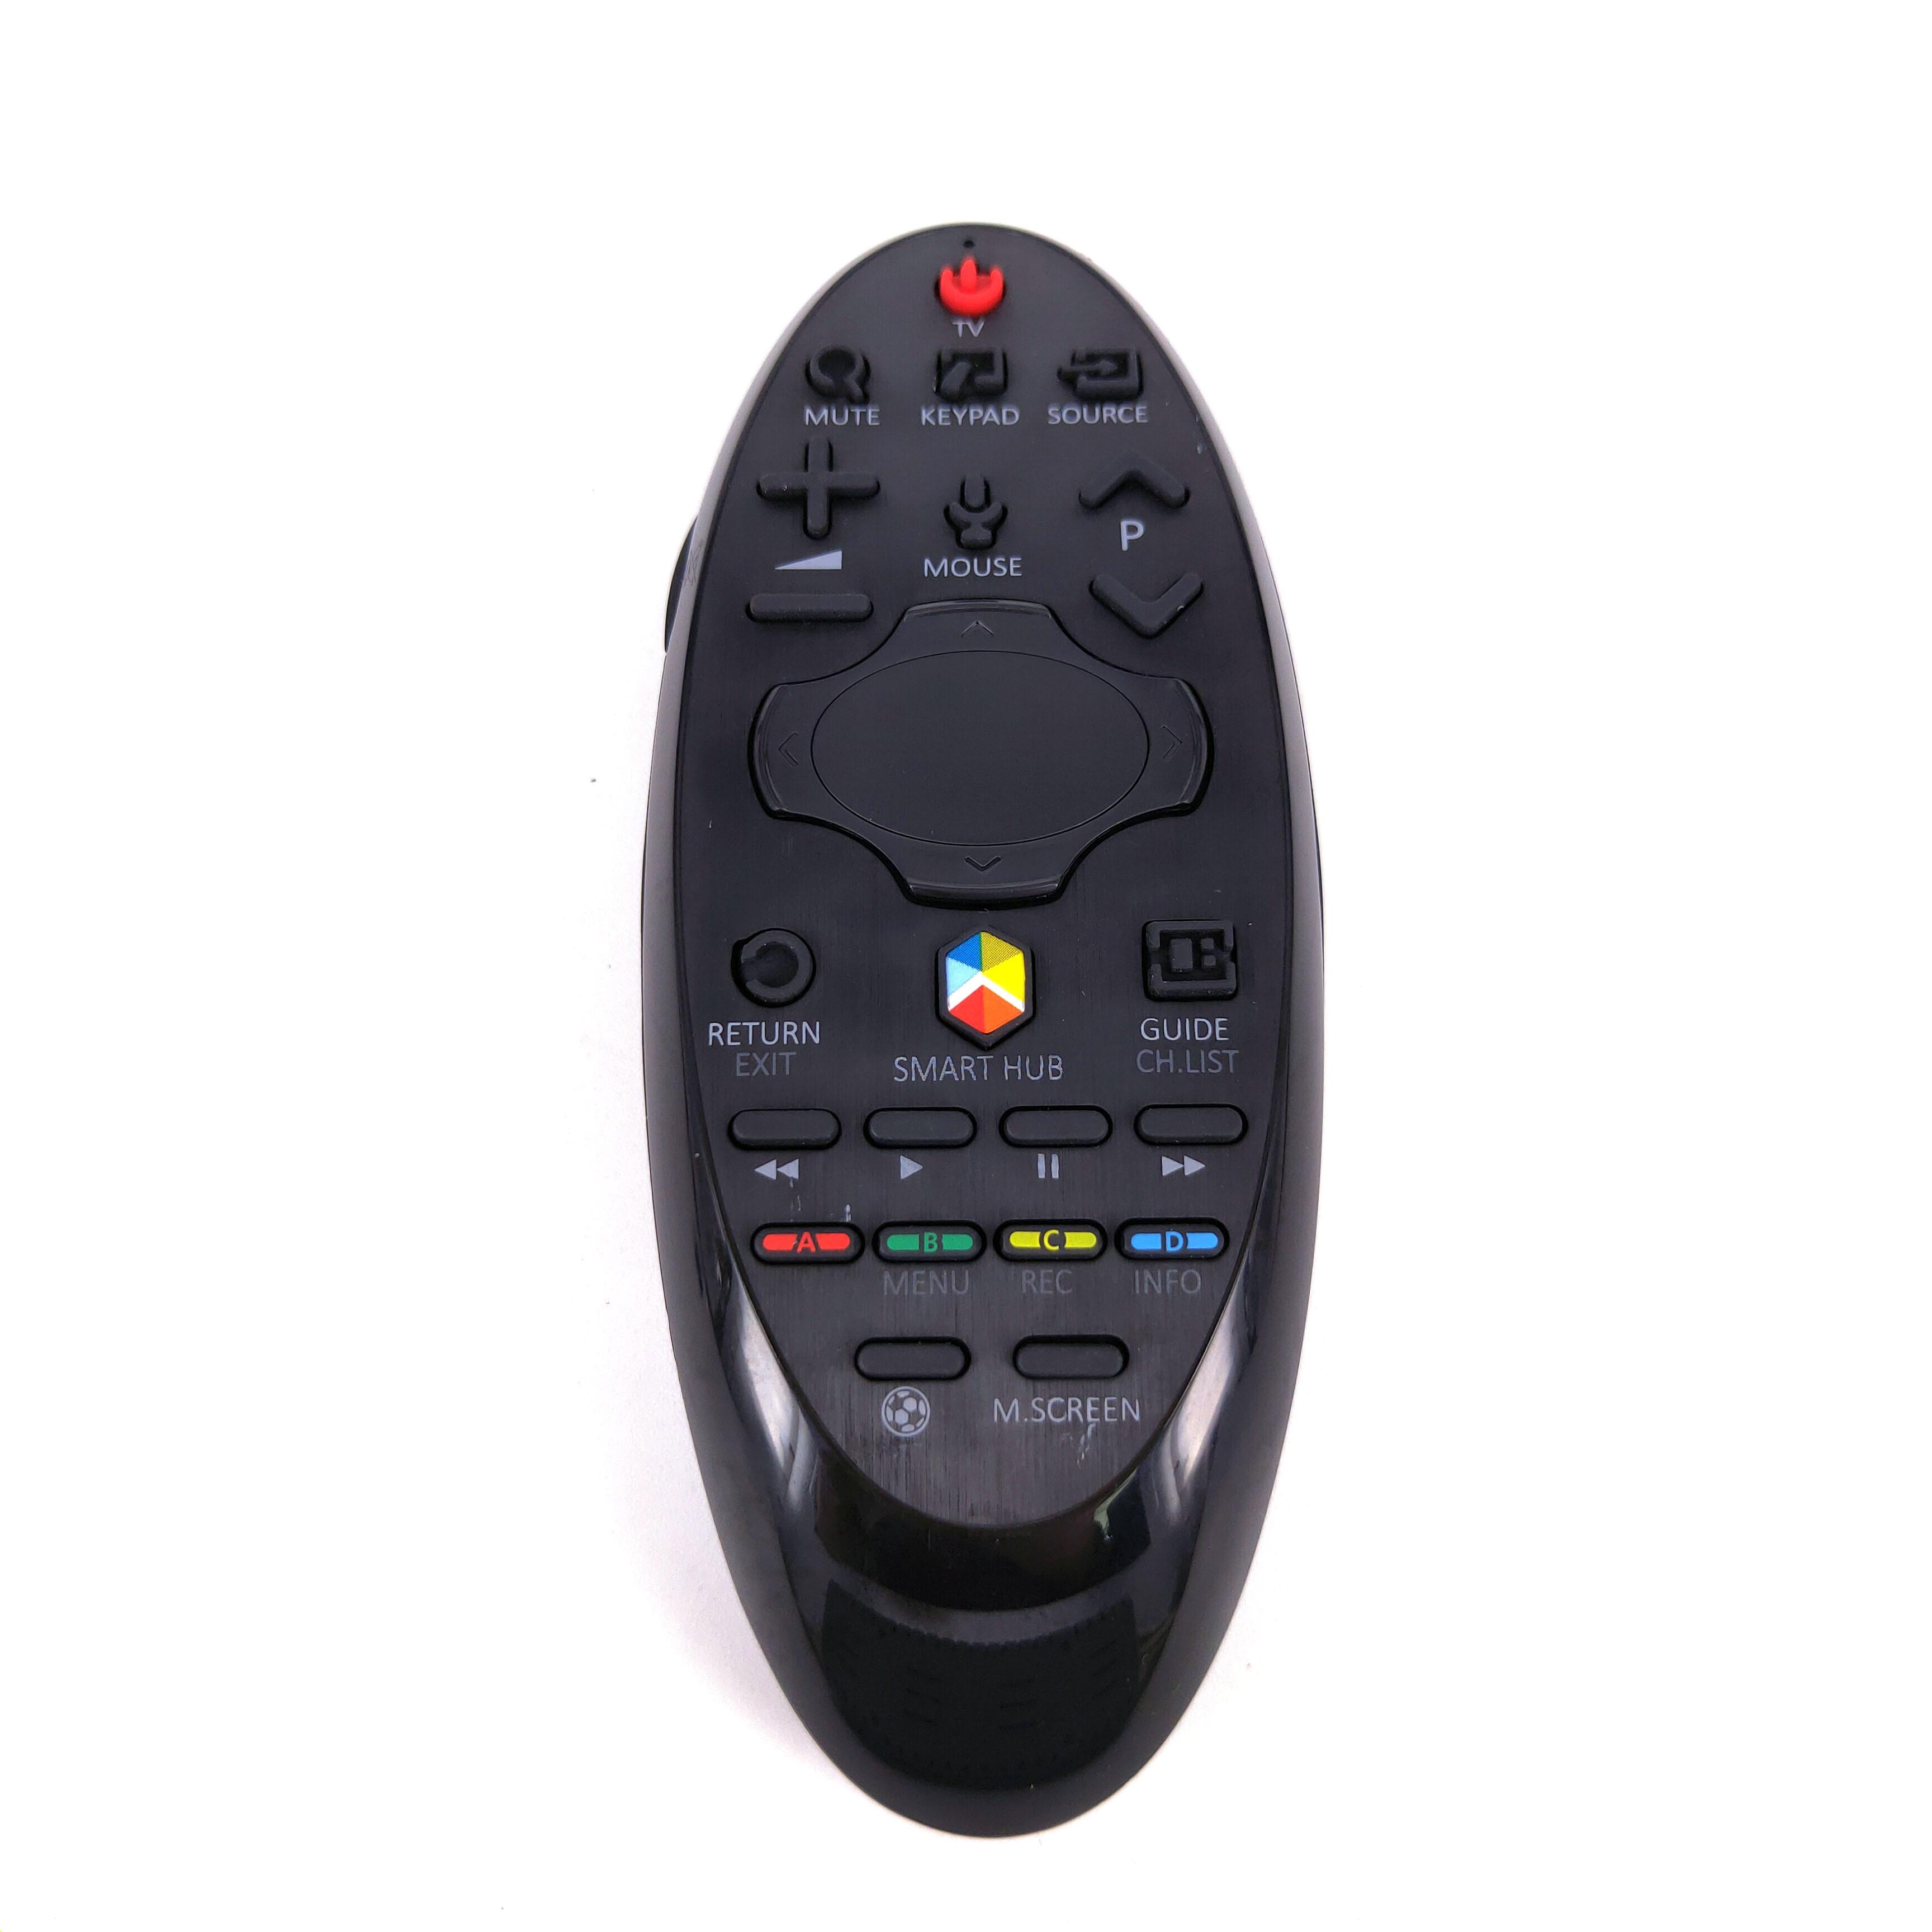 Nuevo YY-604 Replacemnet para SAMSUNG BN59-01184D BN59-01181D Control remoto Smart TV Hub de sonido de Audio contacto Fernbedineung